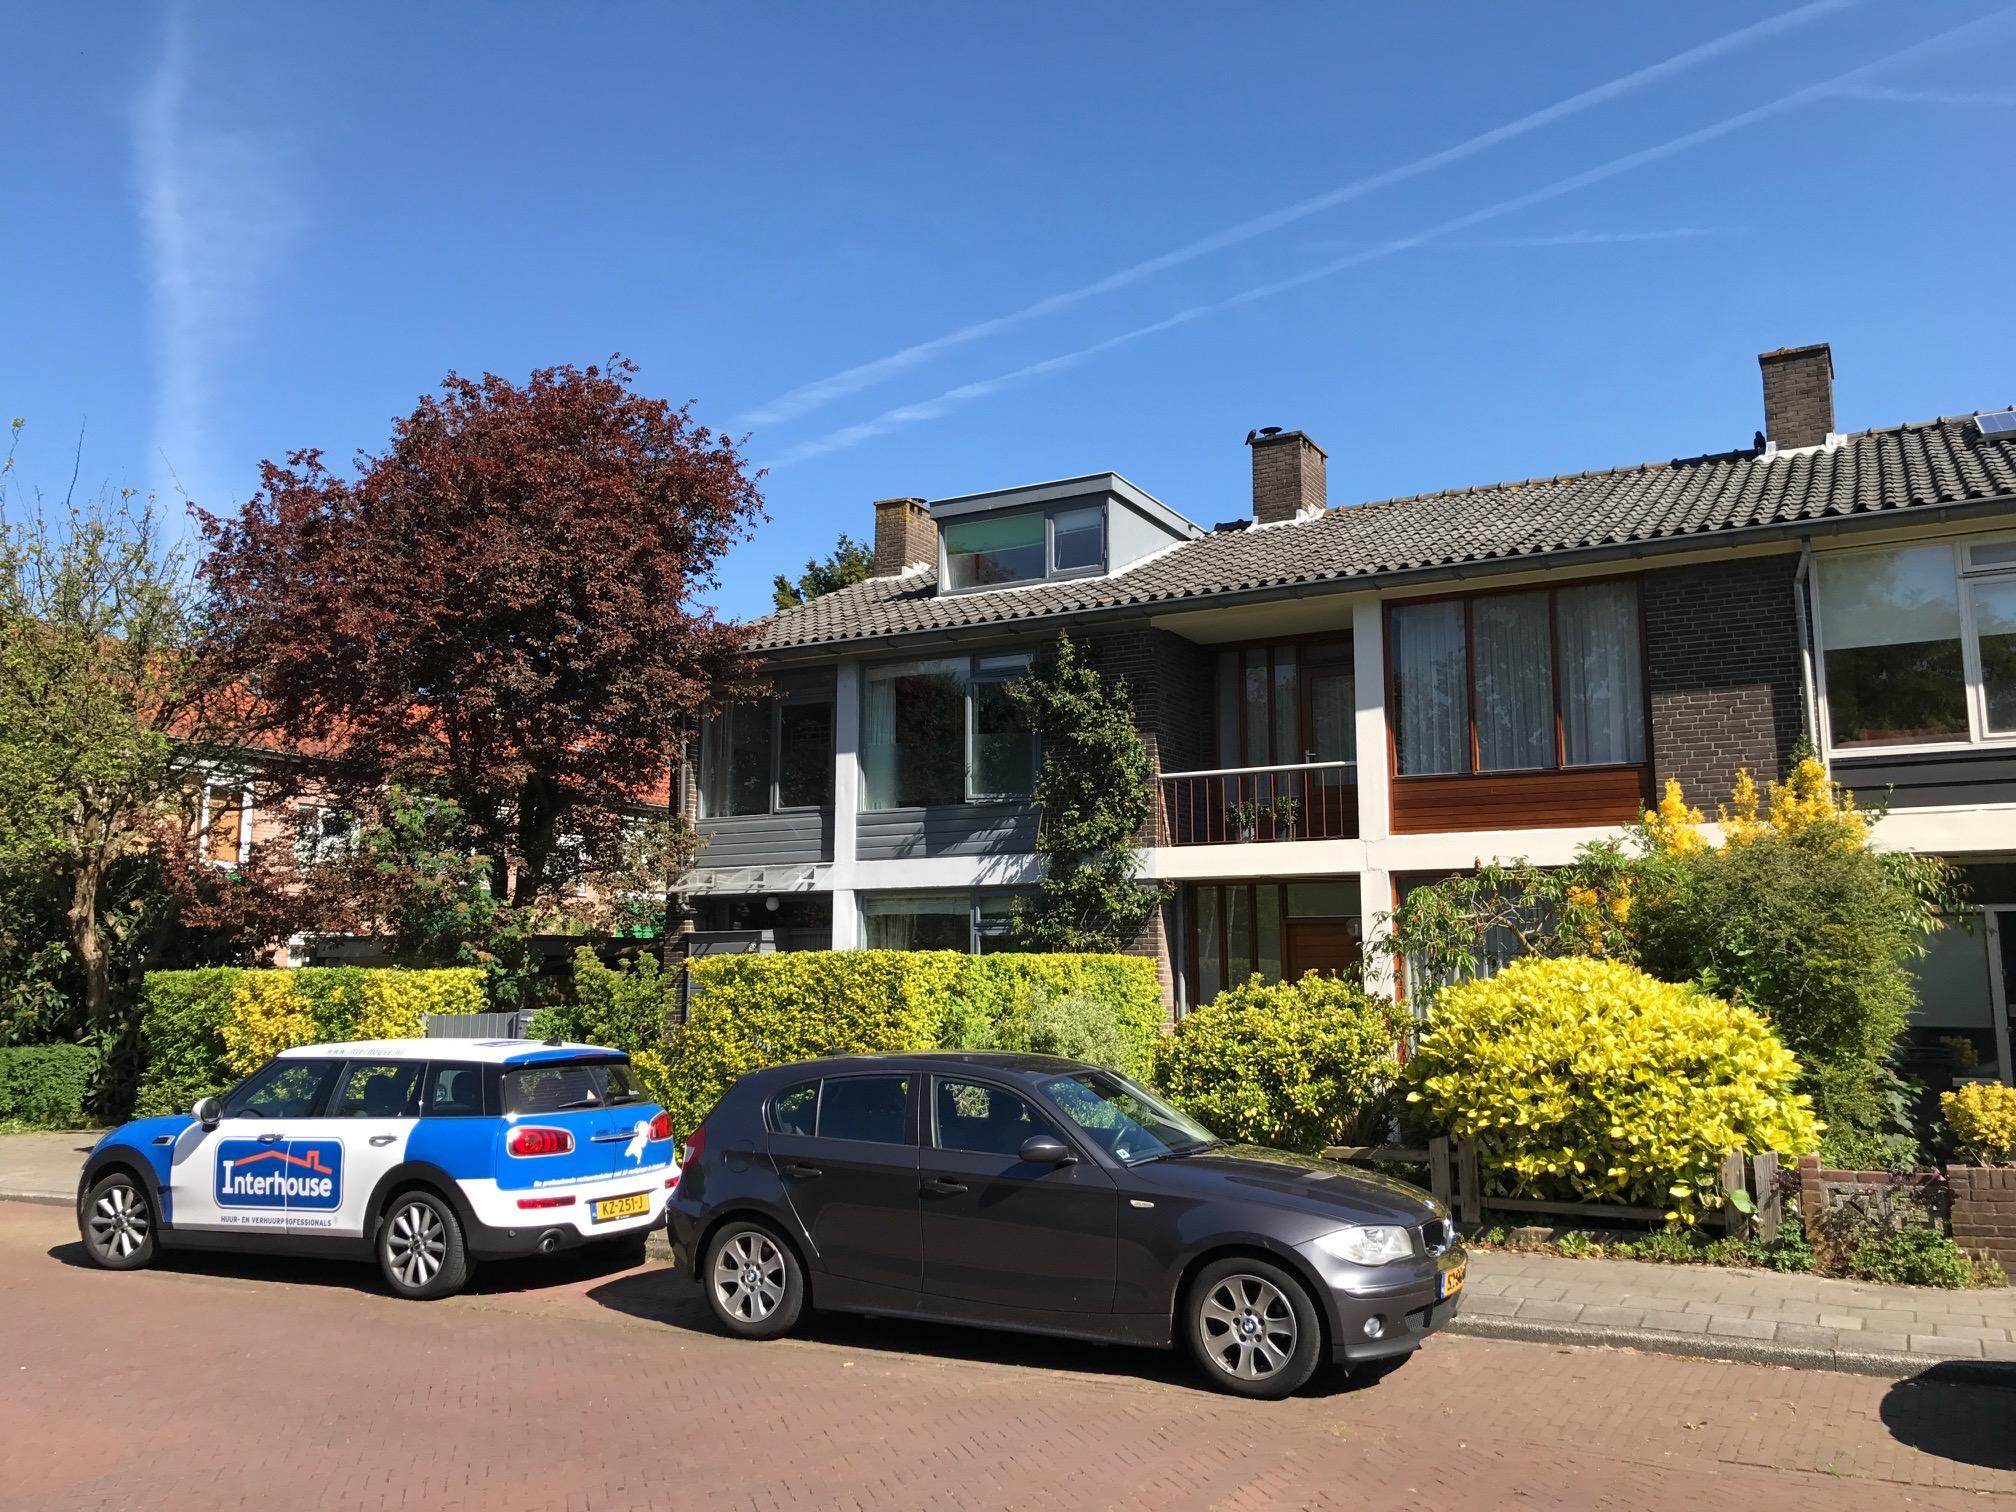 Haagbeuklaan, Amsterdam